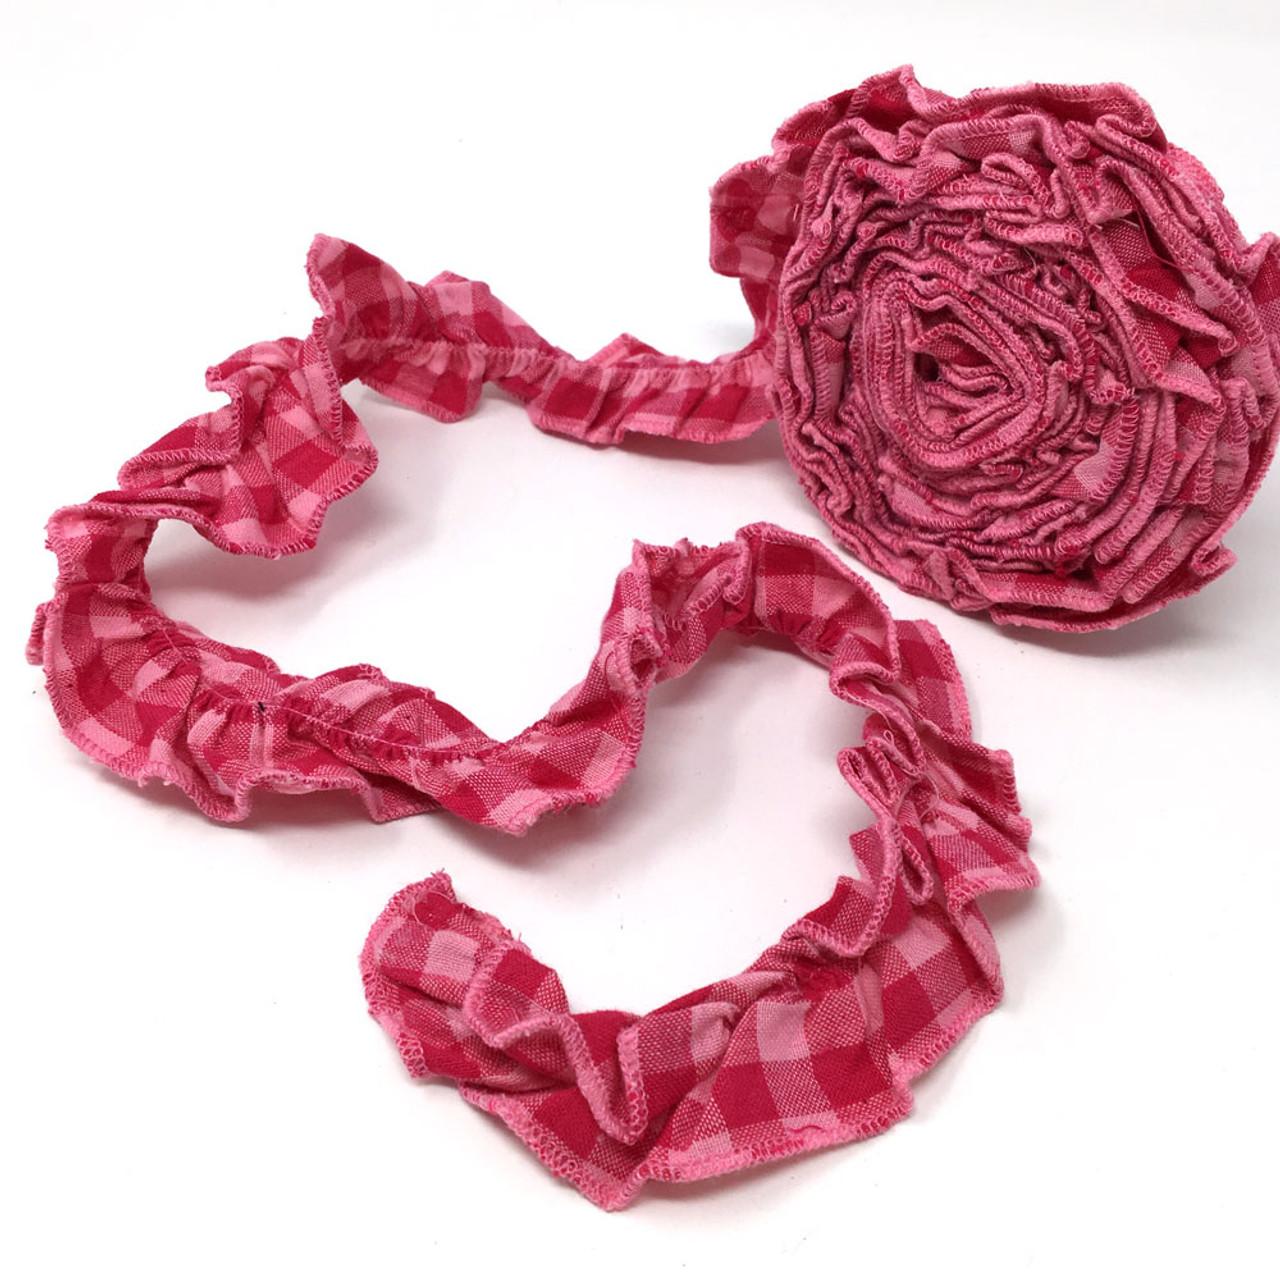 Strawberry Pink 5 Ruffled Trim/Garland  - 1 roll - 144 inches (12 feet)